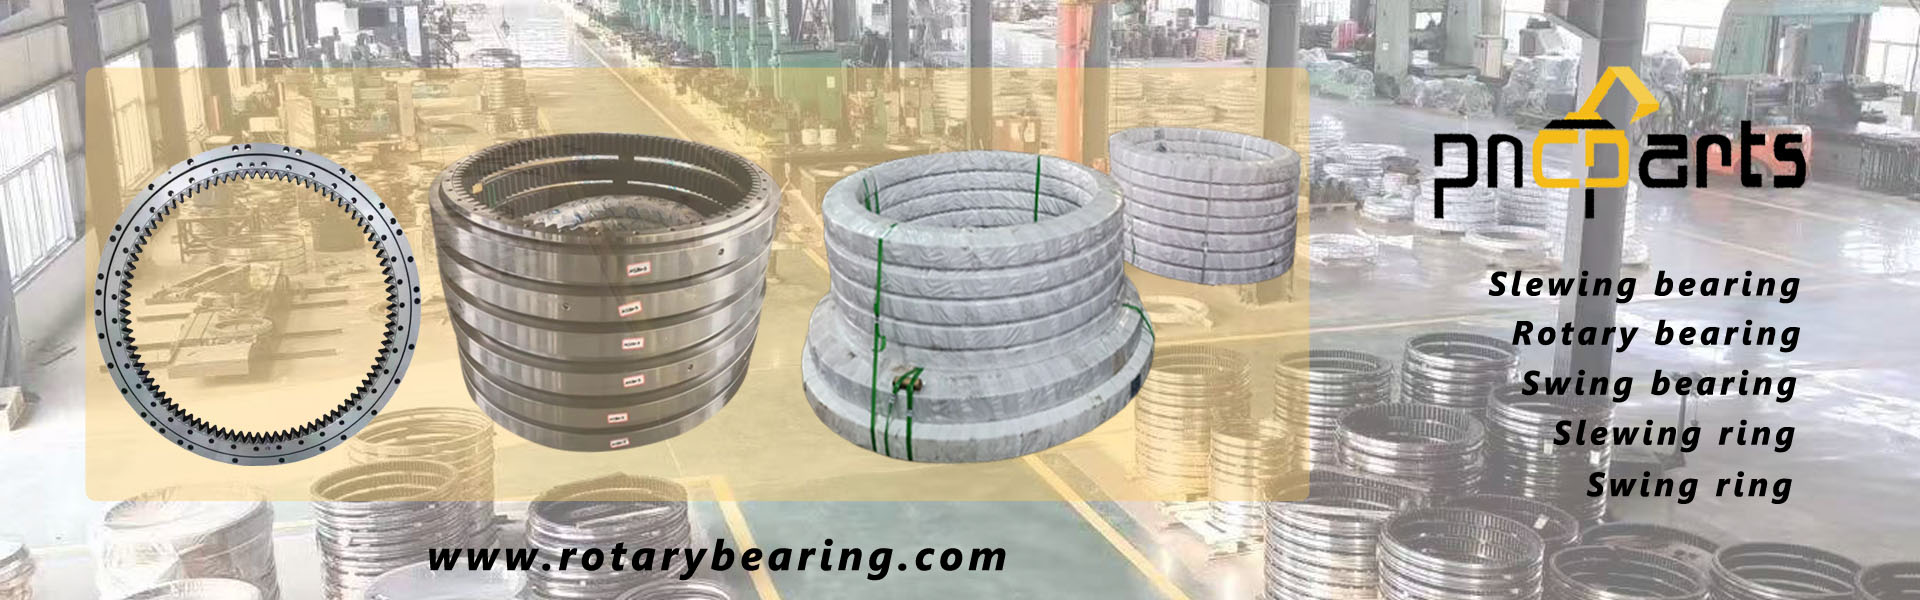 Slewing bearing swing bearingswing ring Pnchyd.com  - Home